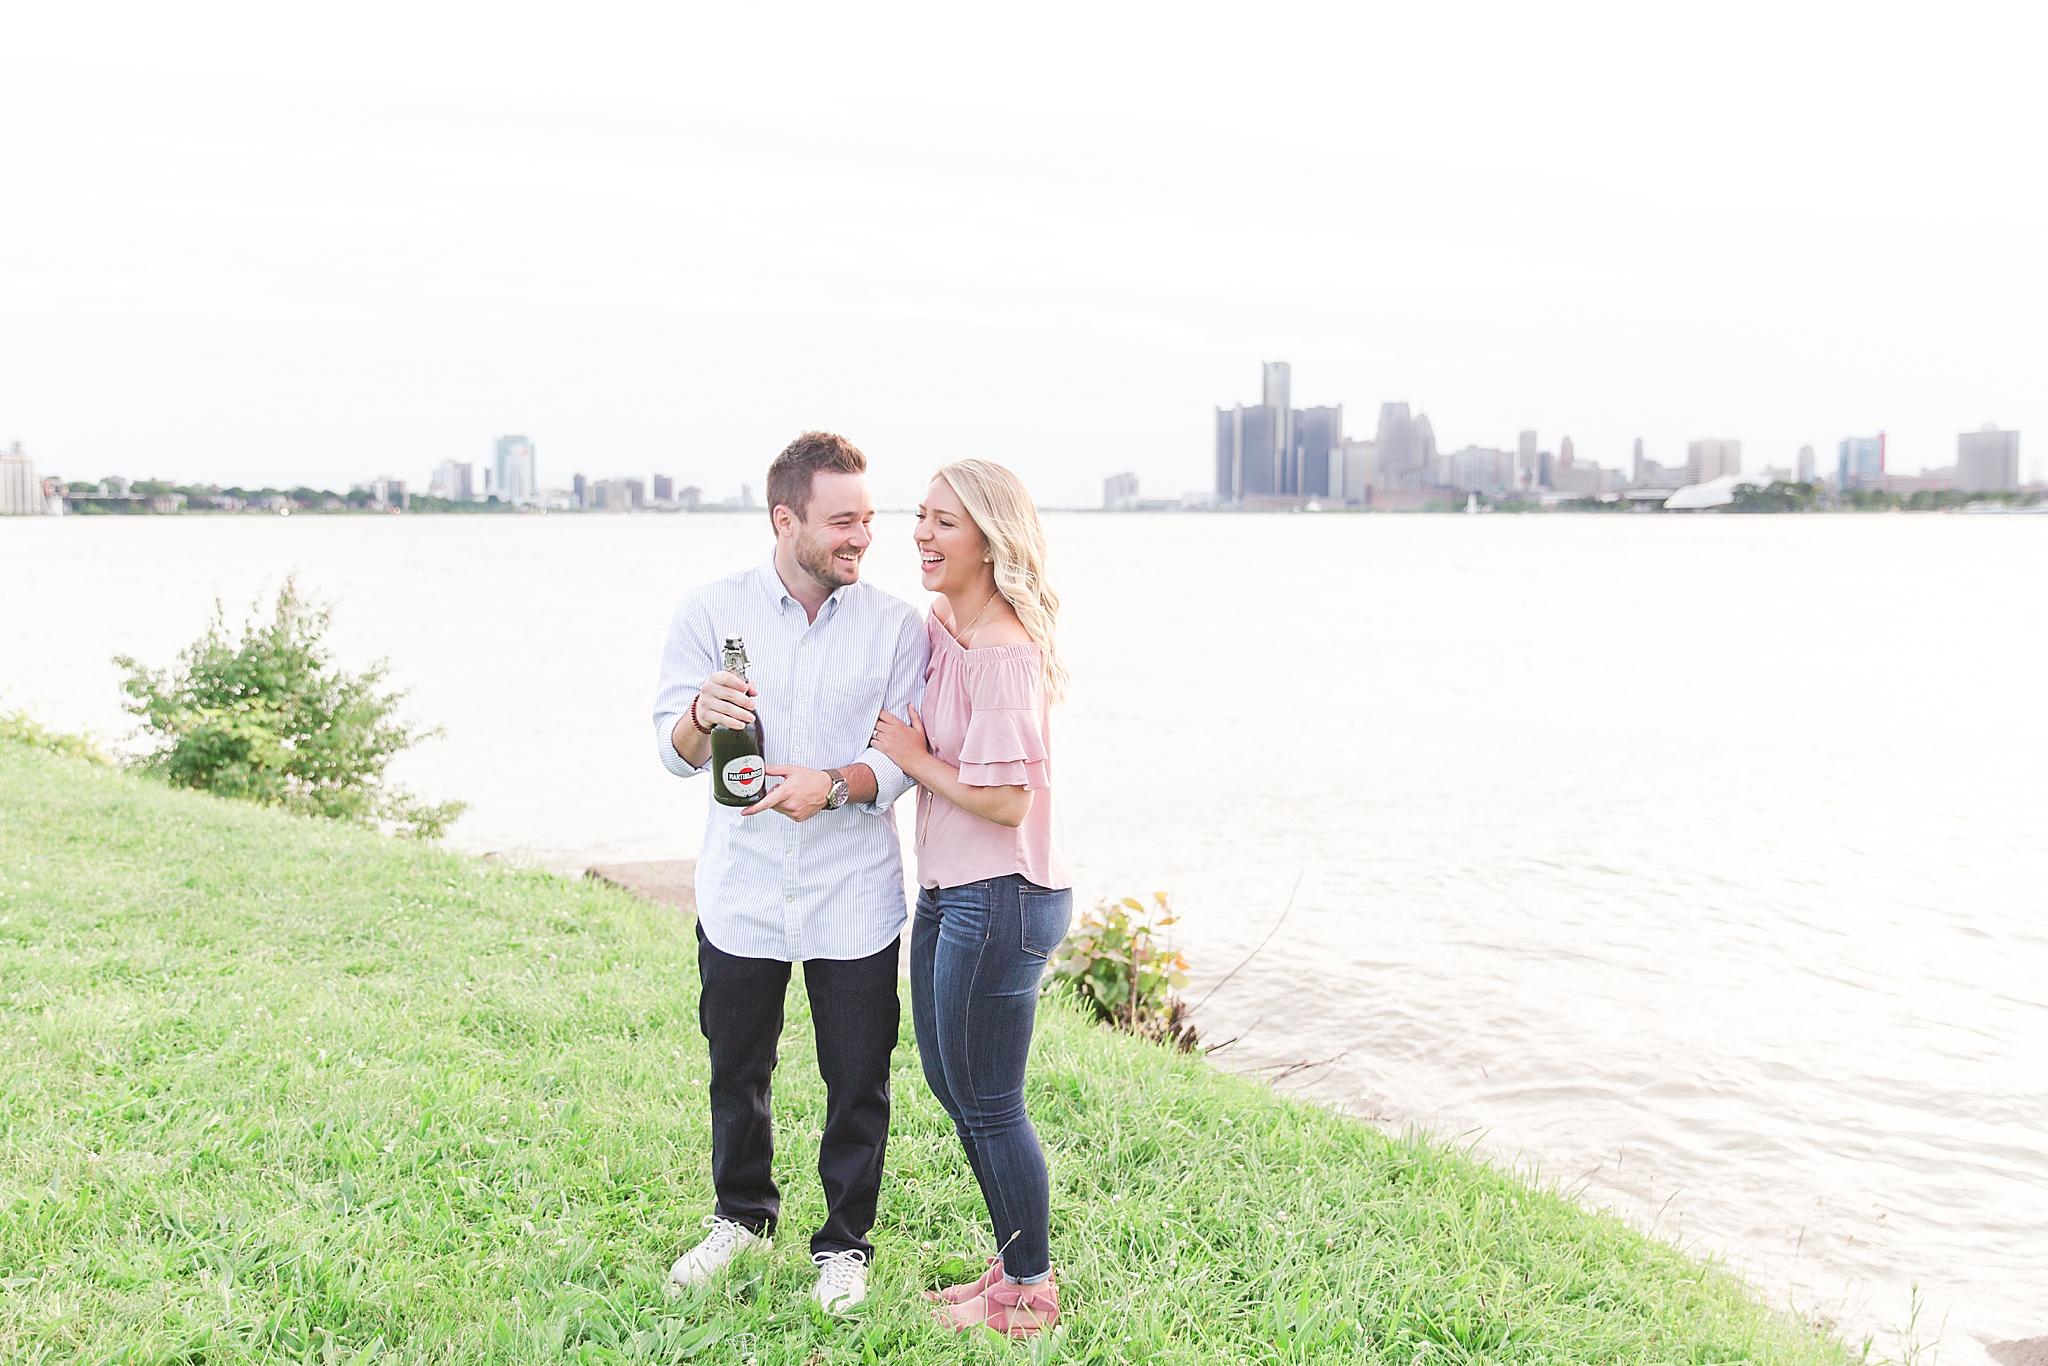 detroit-wedding-photographer-downtown-detroit-belle-isle-engagement-photos-sarah-eric-by-courtney-carolyn-photography_0045.jpg